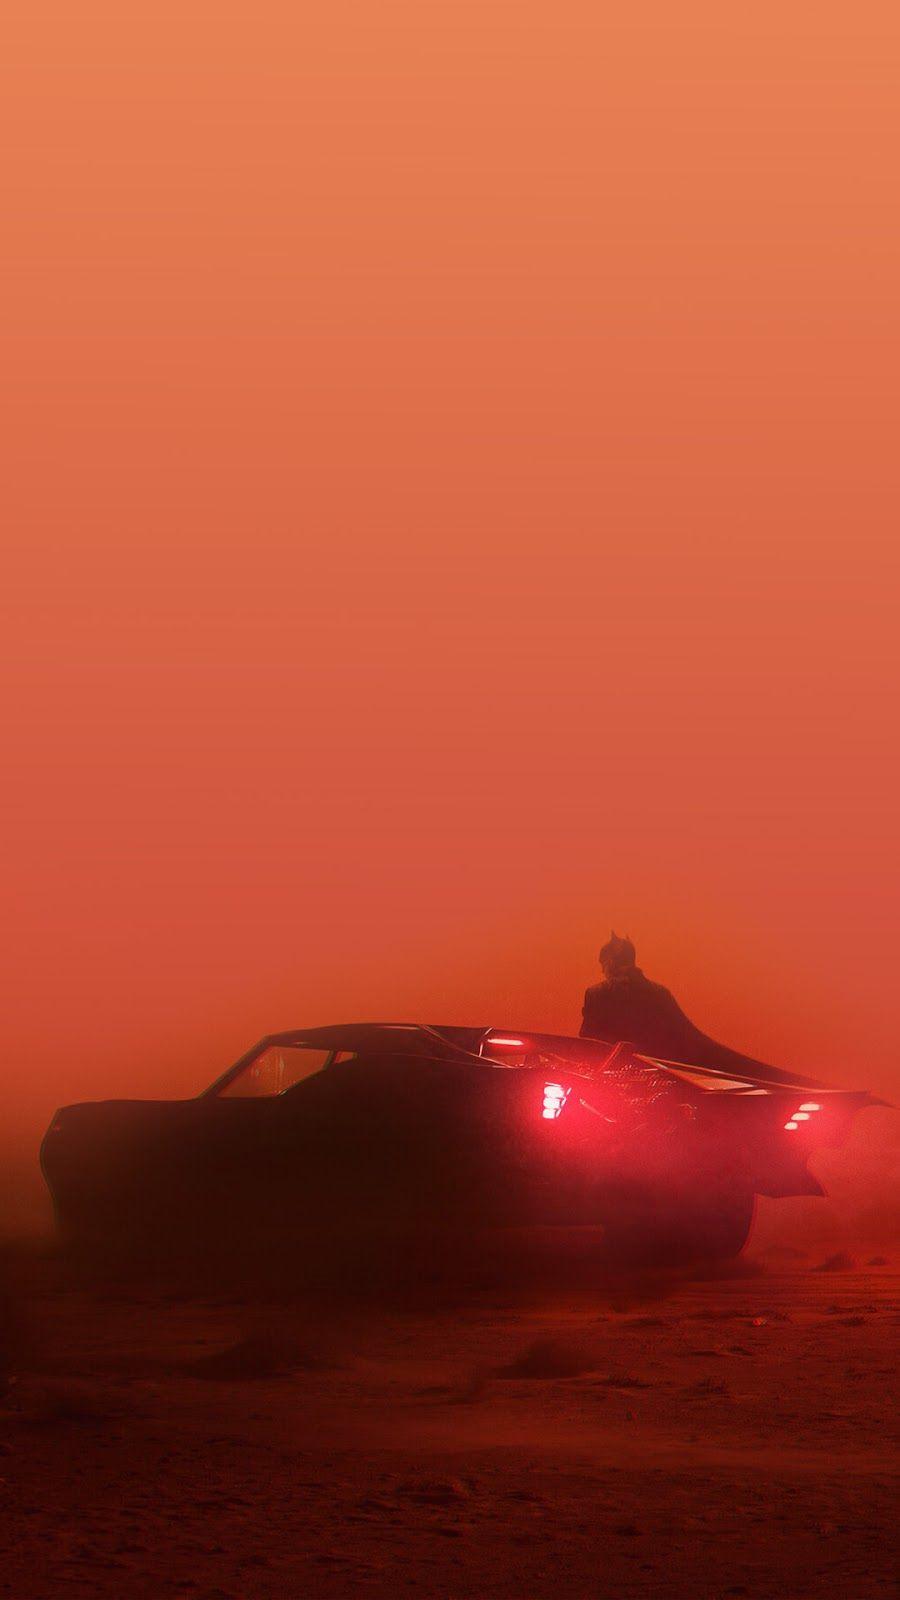 Blade Runner 2049 2017 Phone Wallpaper Moviemania Blade Runner Wallpaper Blade Runner 2049 Blade Runner